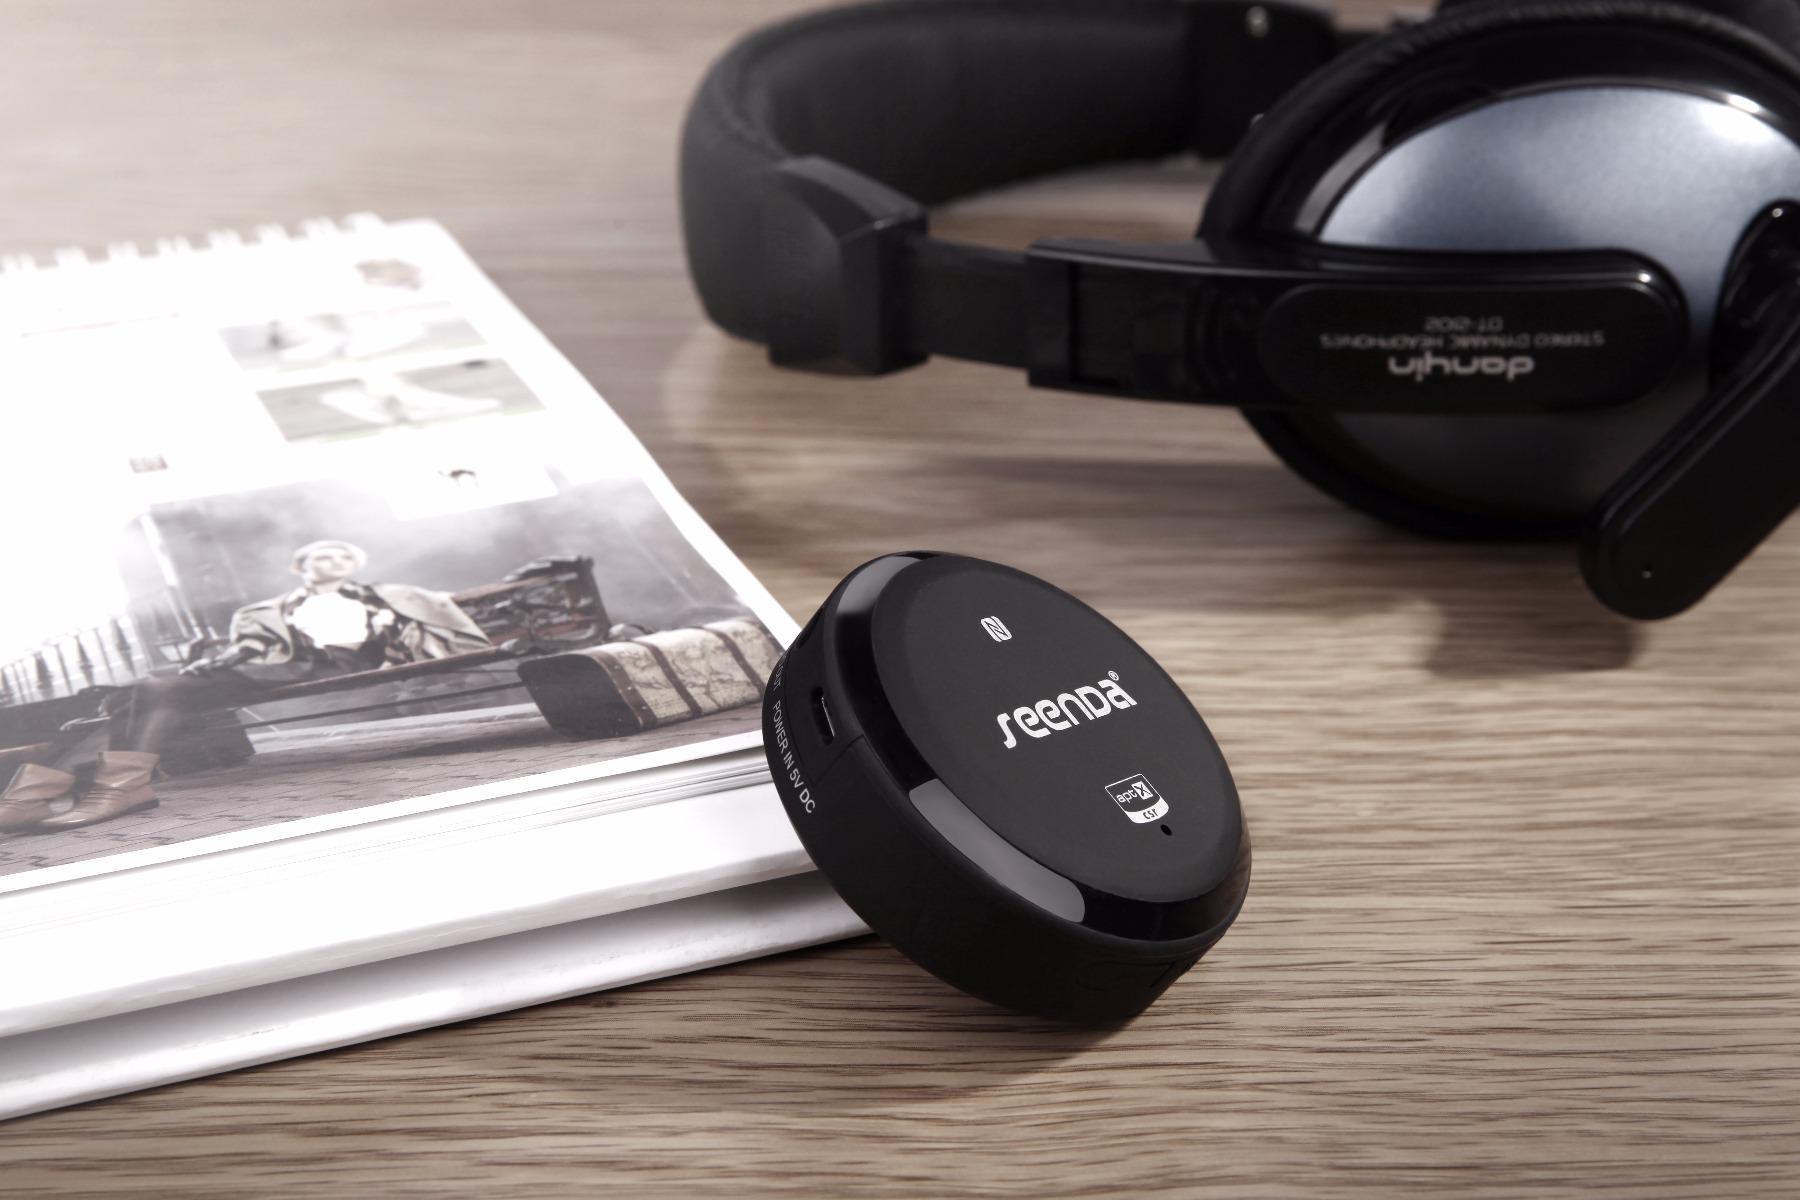 Seenda IBT-08B Desktop NFC Bluetooth Music Receiver